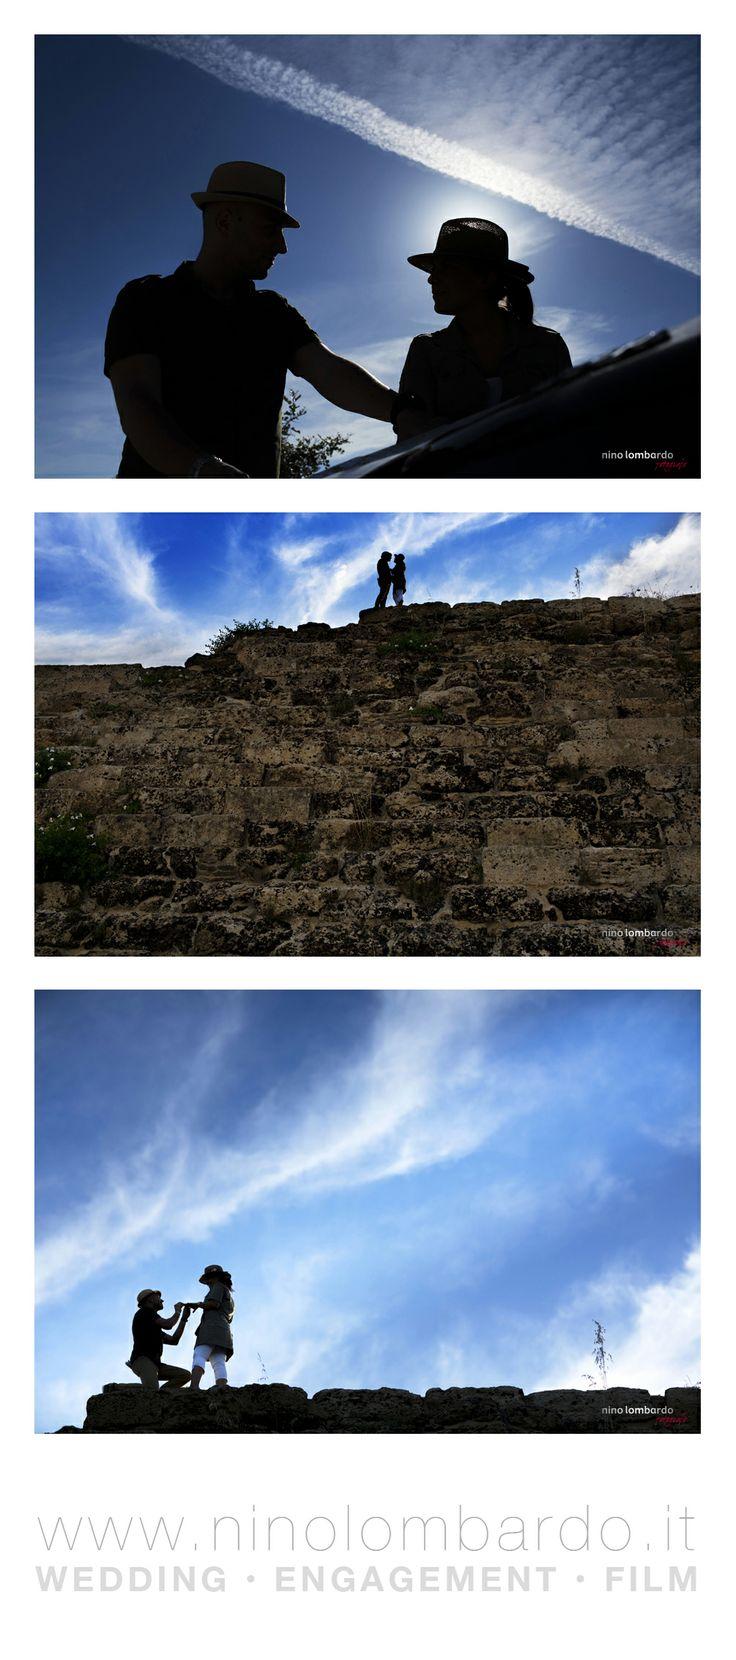 An adventurous marriage proposal ... • Engagement photo session • © www.ninolombardo.it